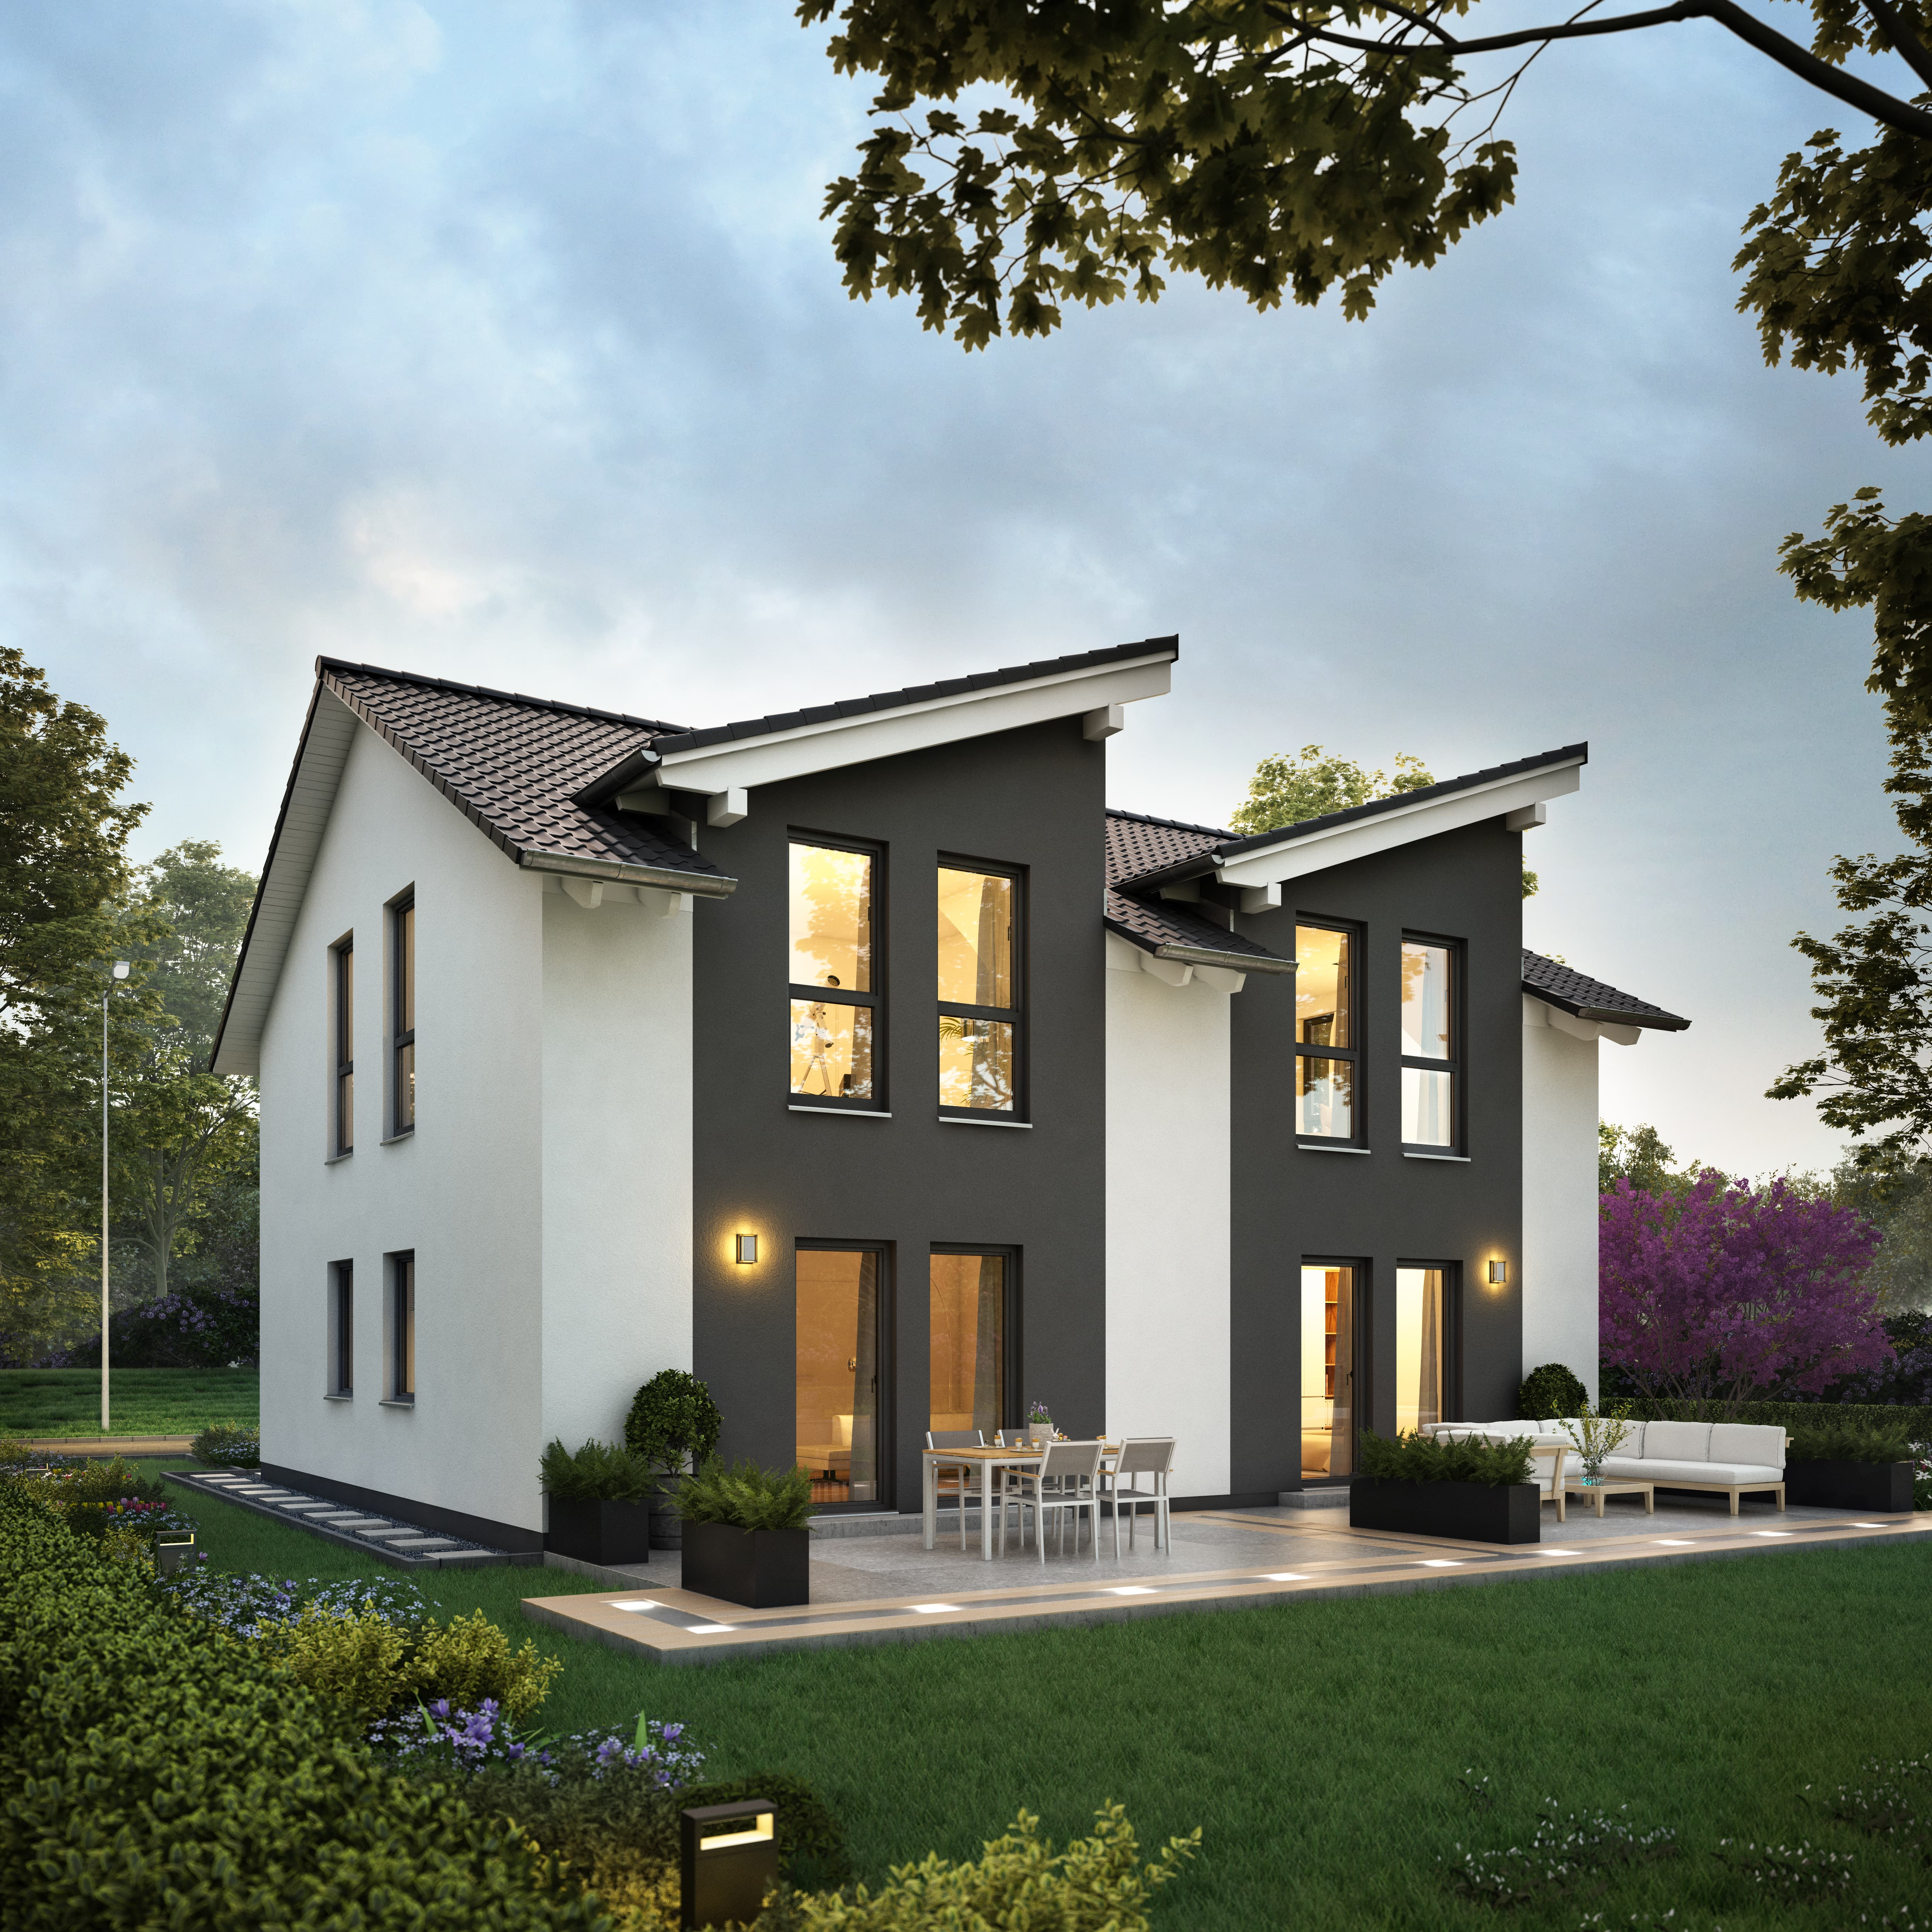 massa haus lifestyle 3 massa haus gmbh anbieter. Black Bedroom Furniture Sets. Home Design Ideas